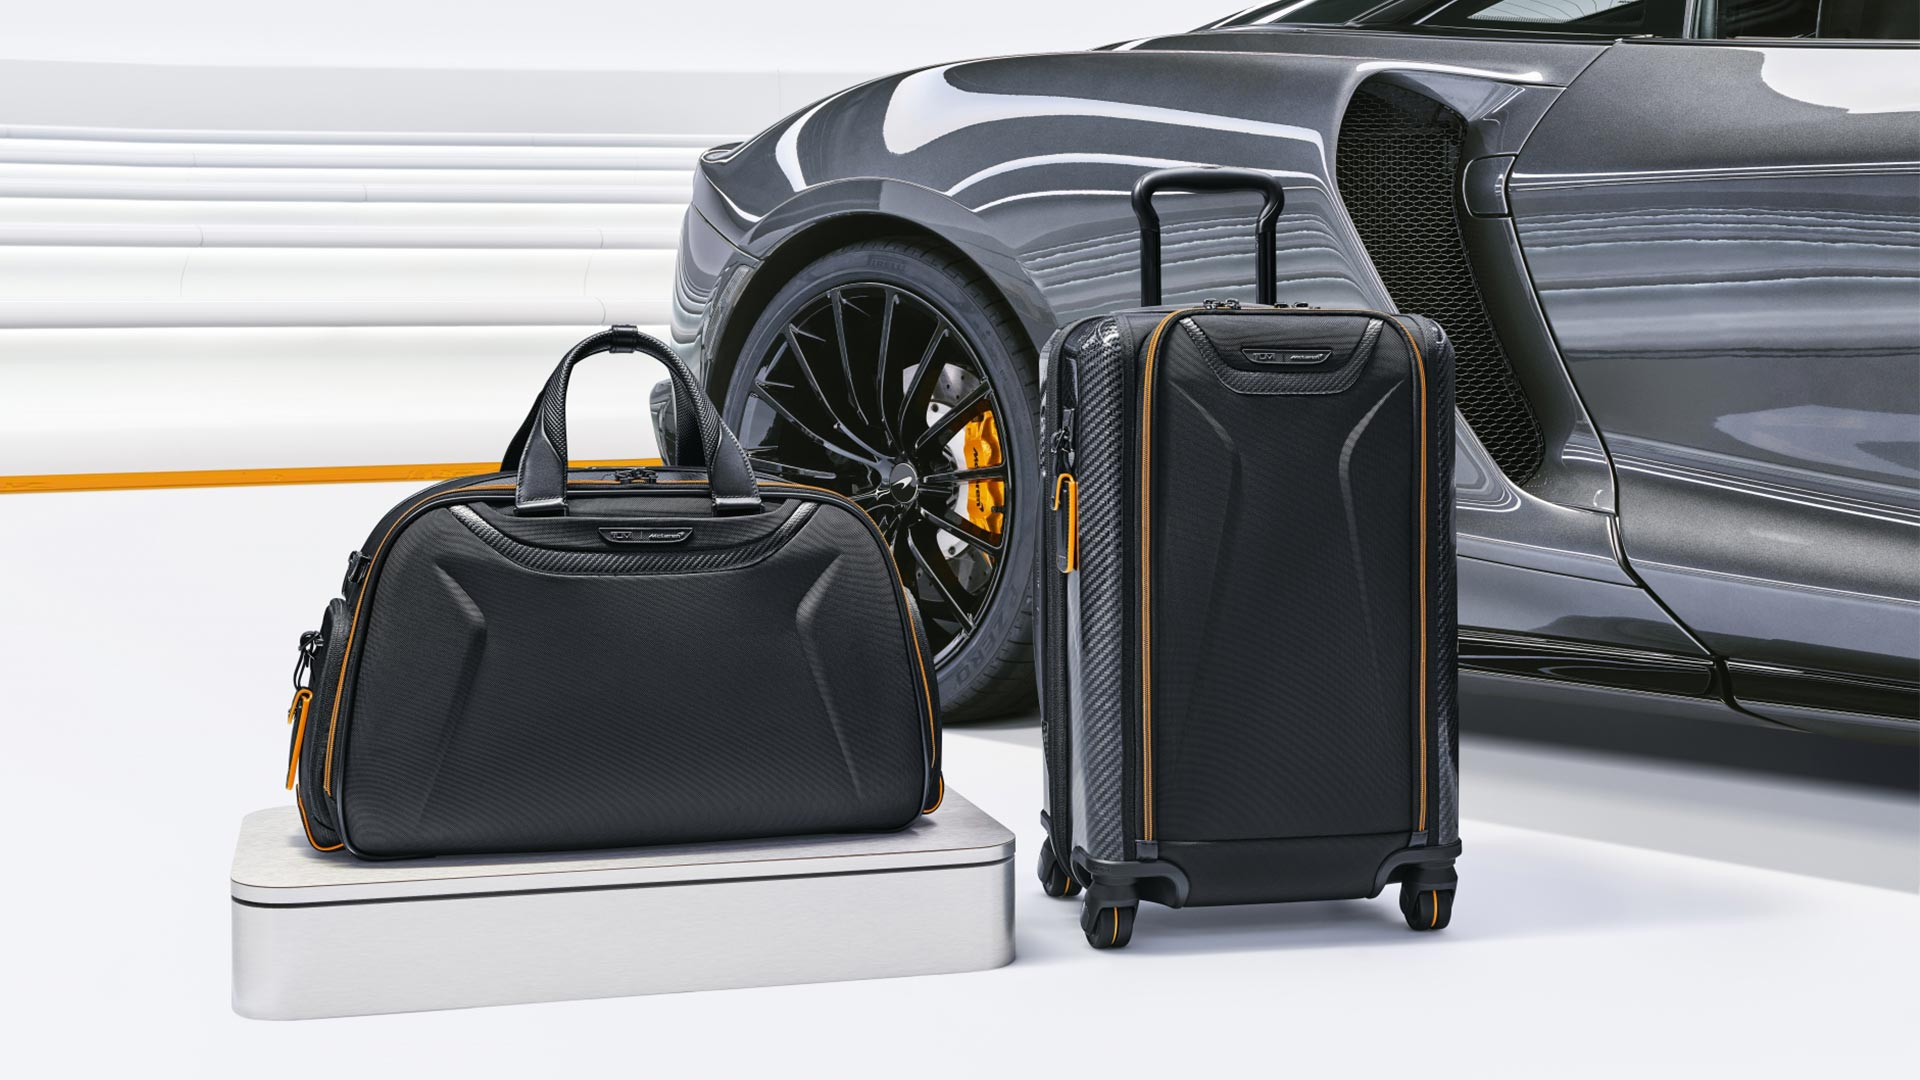 Tumi's McLaren Inspired Capsule Luggage - Travel Luggages